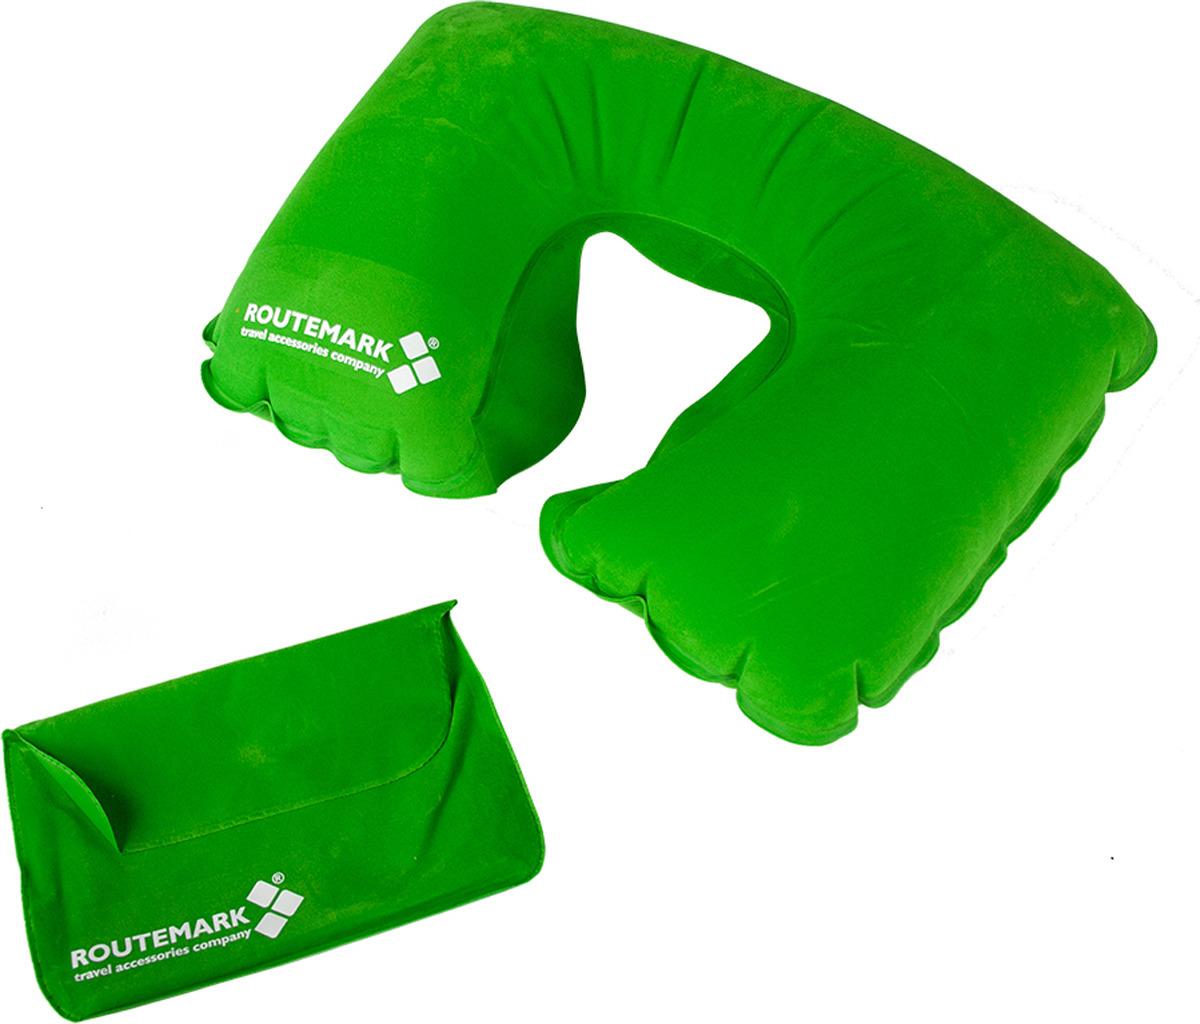 Подушка для путешествий надувная Routemark SAM , цвет: салатовый